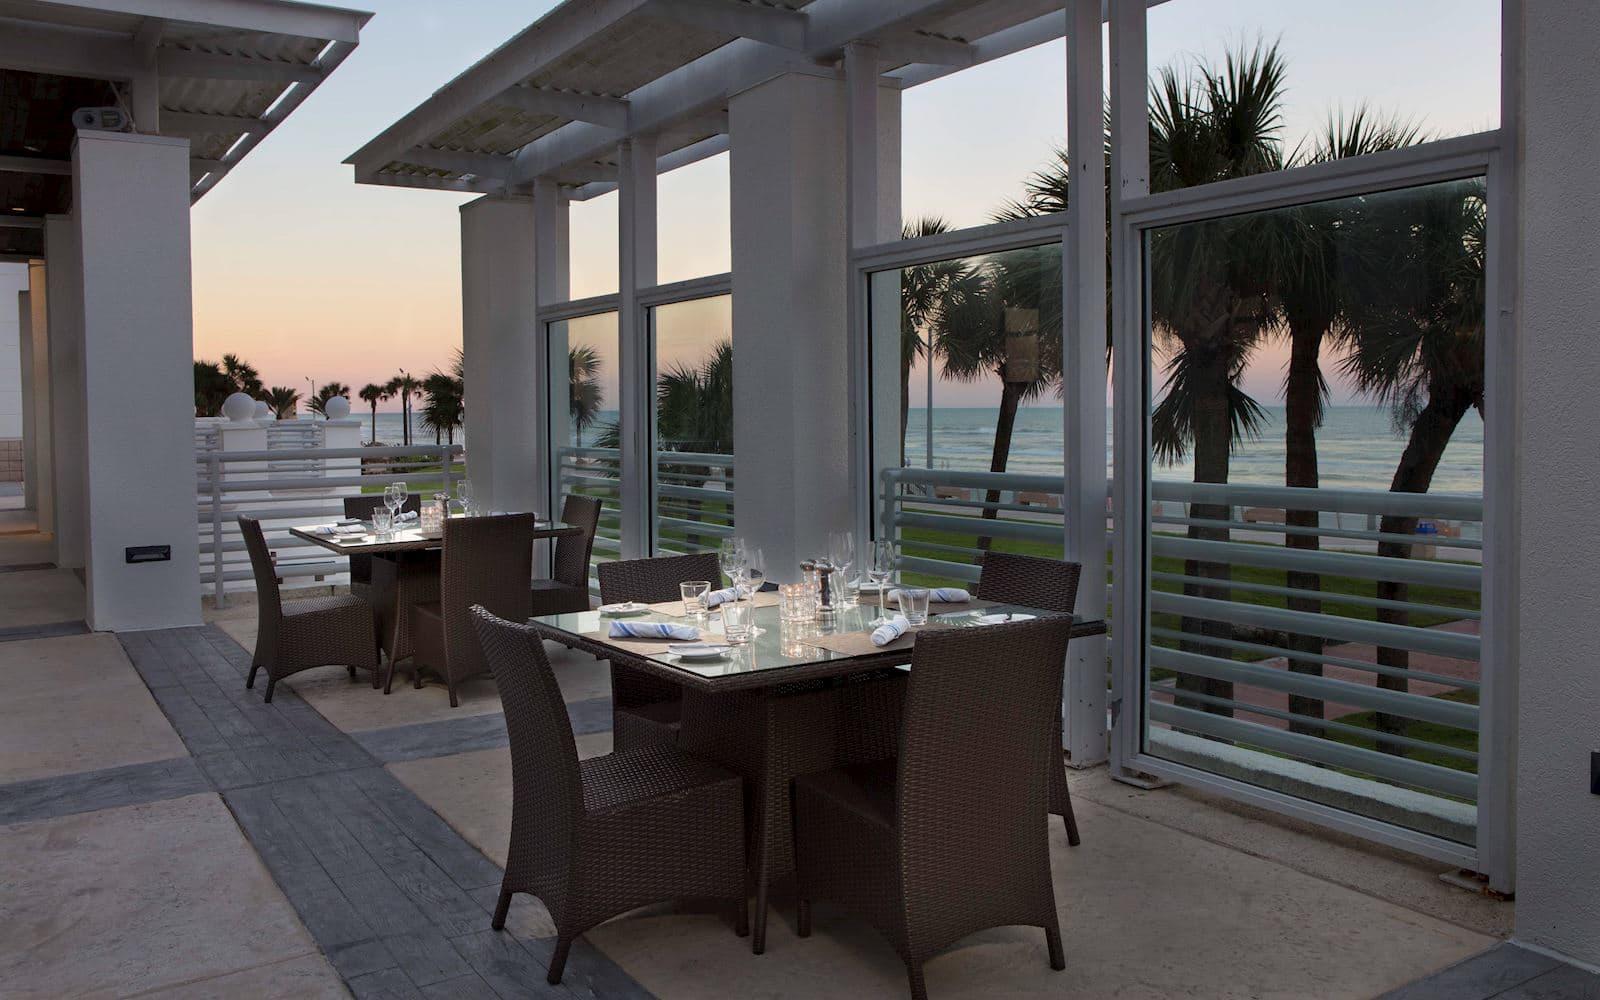 Doc Bales' Grill of Hilton Daytona Beach Oceanfront Resort